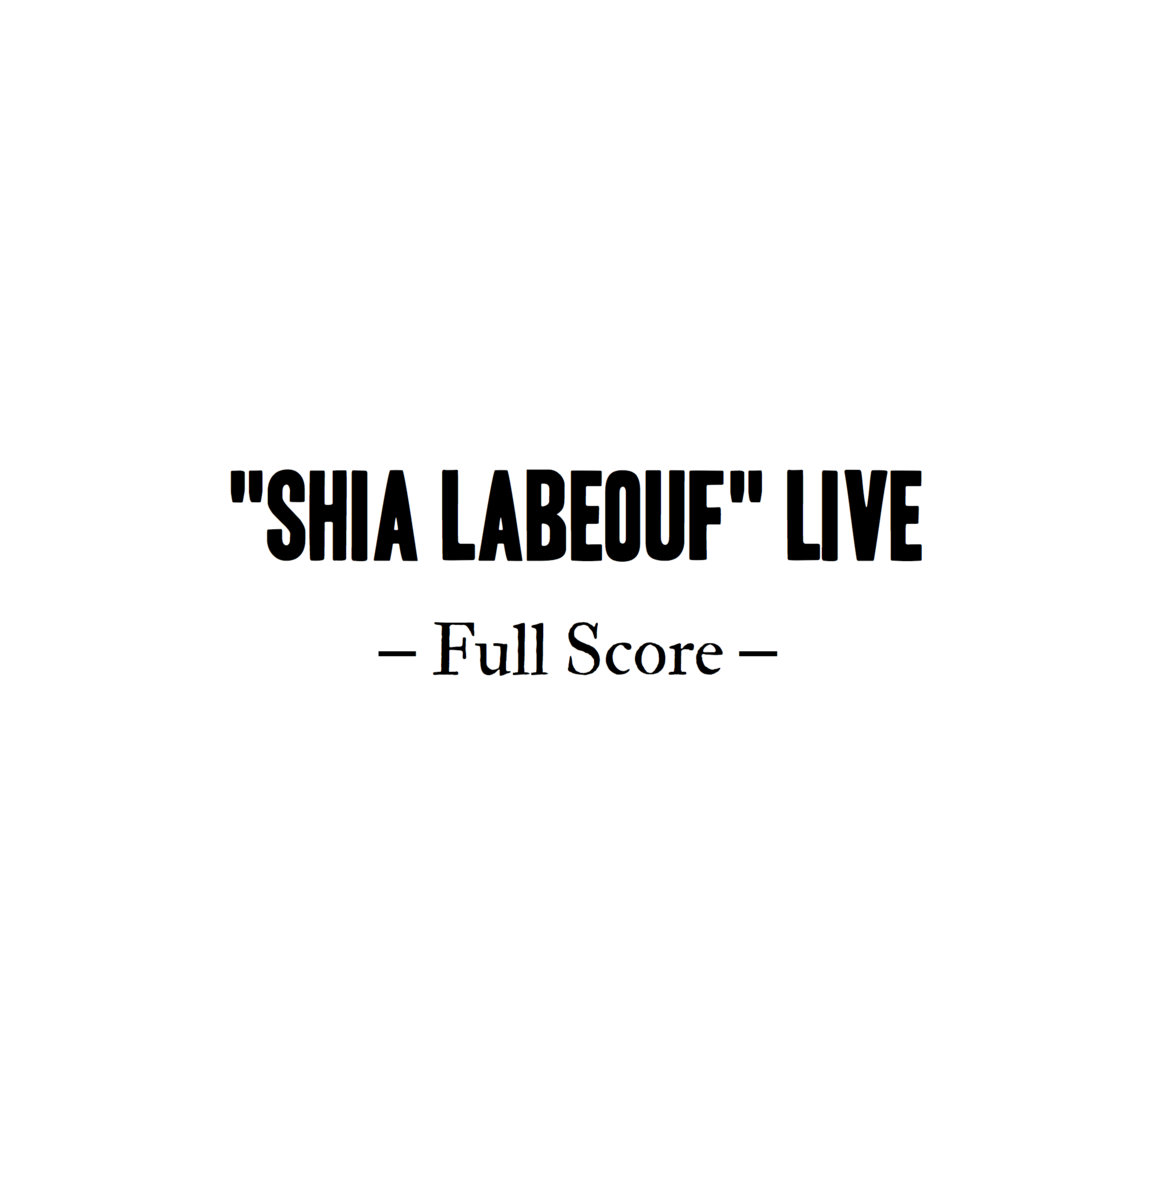 sheet music   u0026quot shia labeouf u0026quot  live